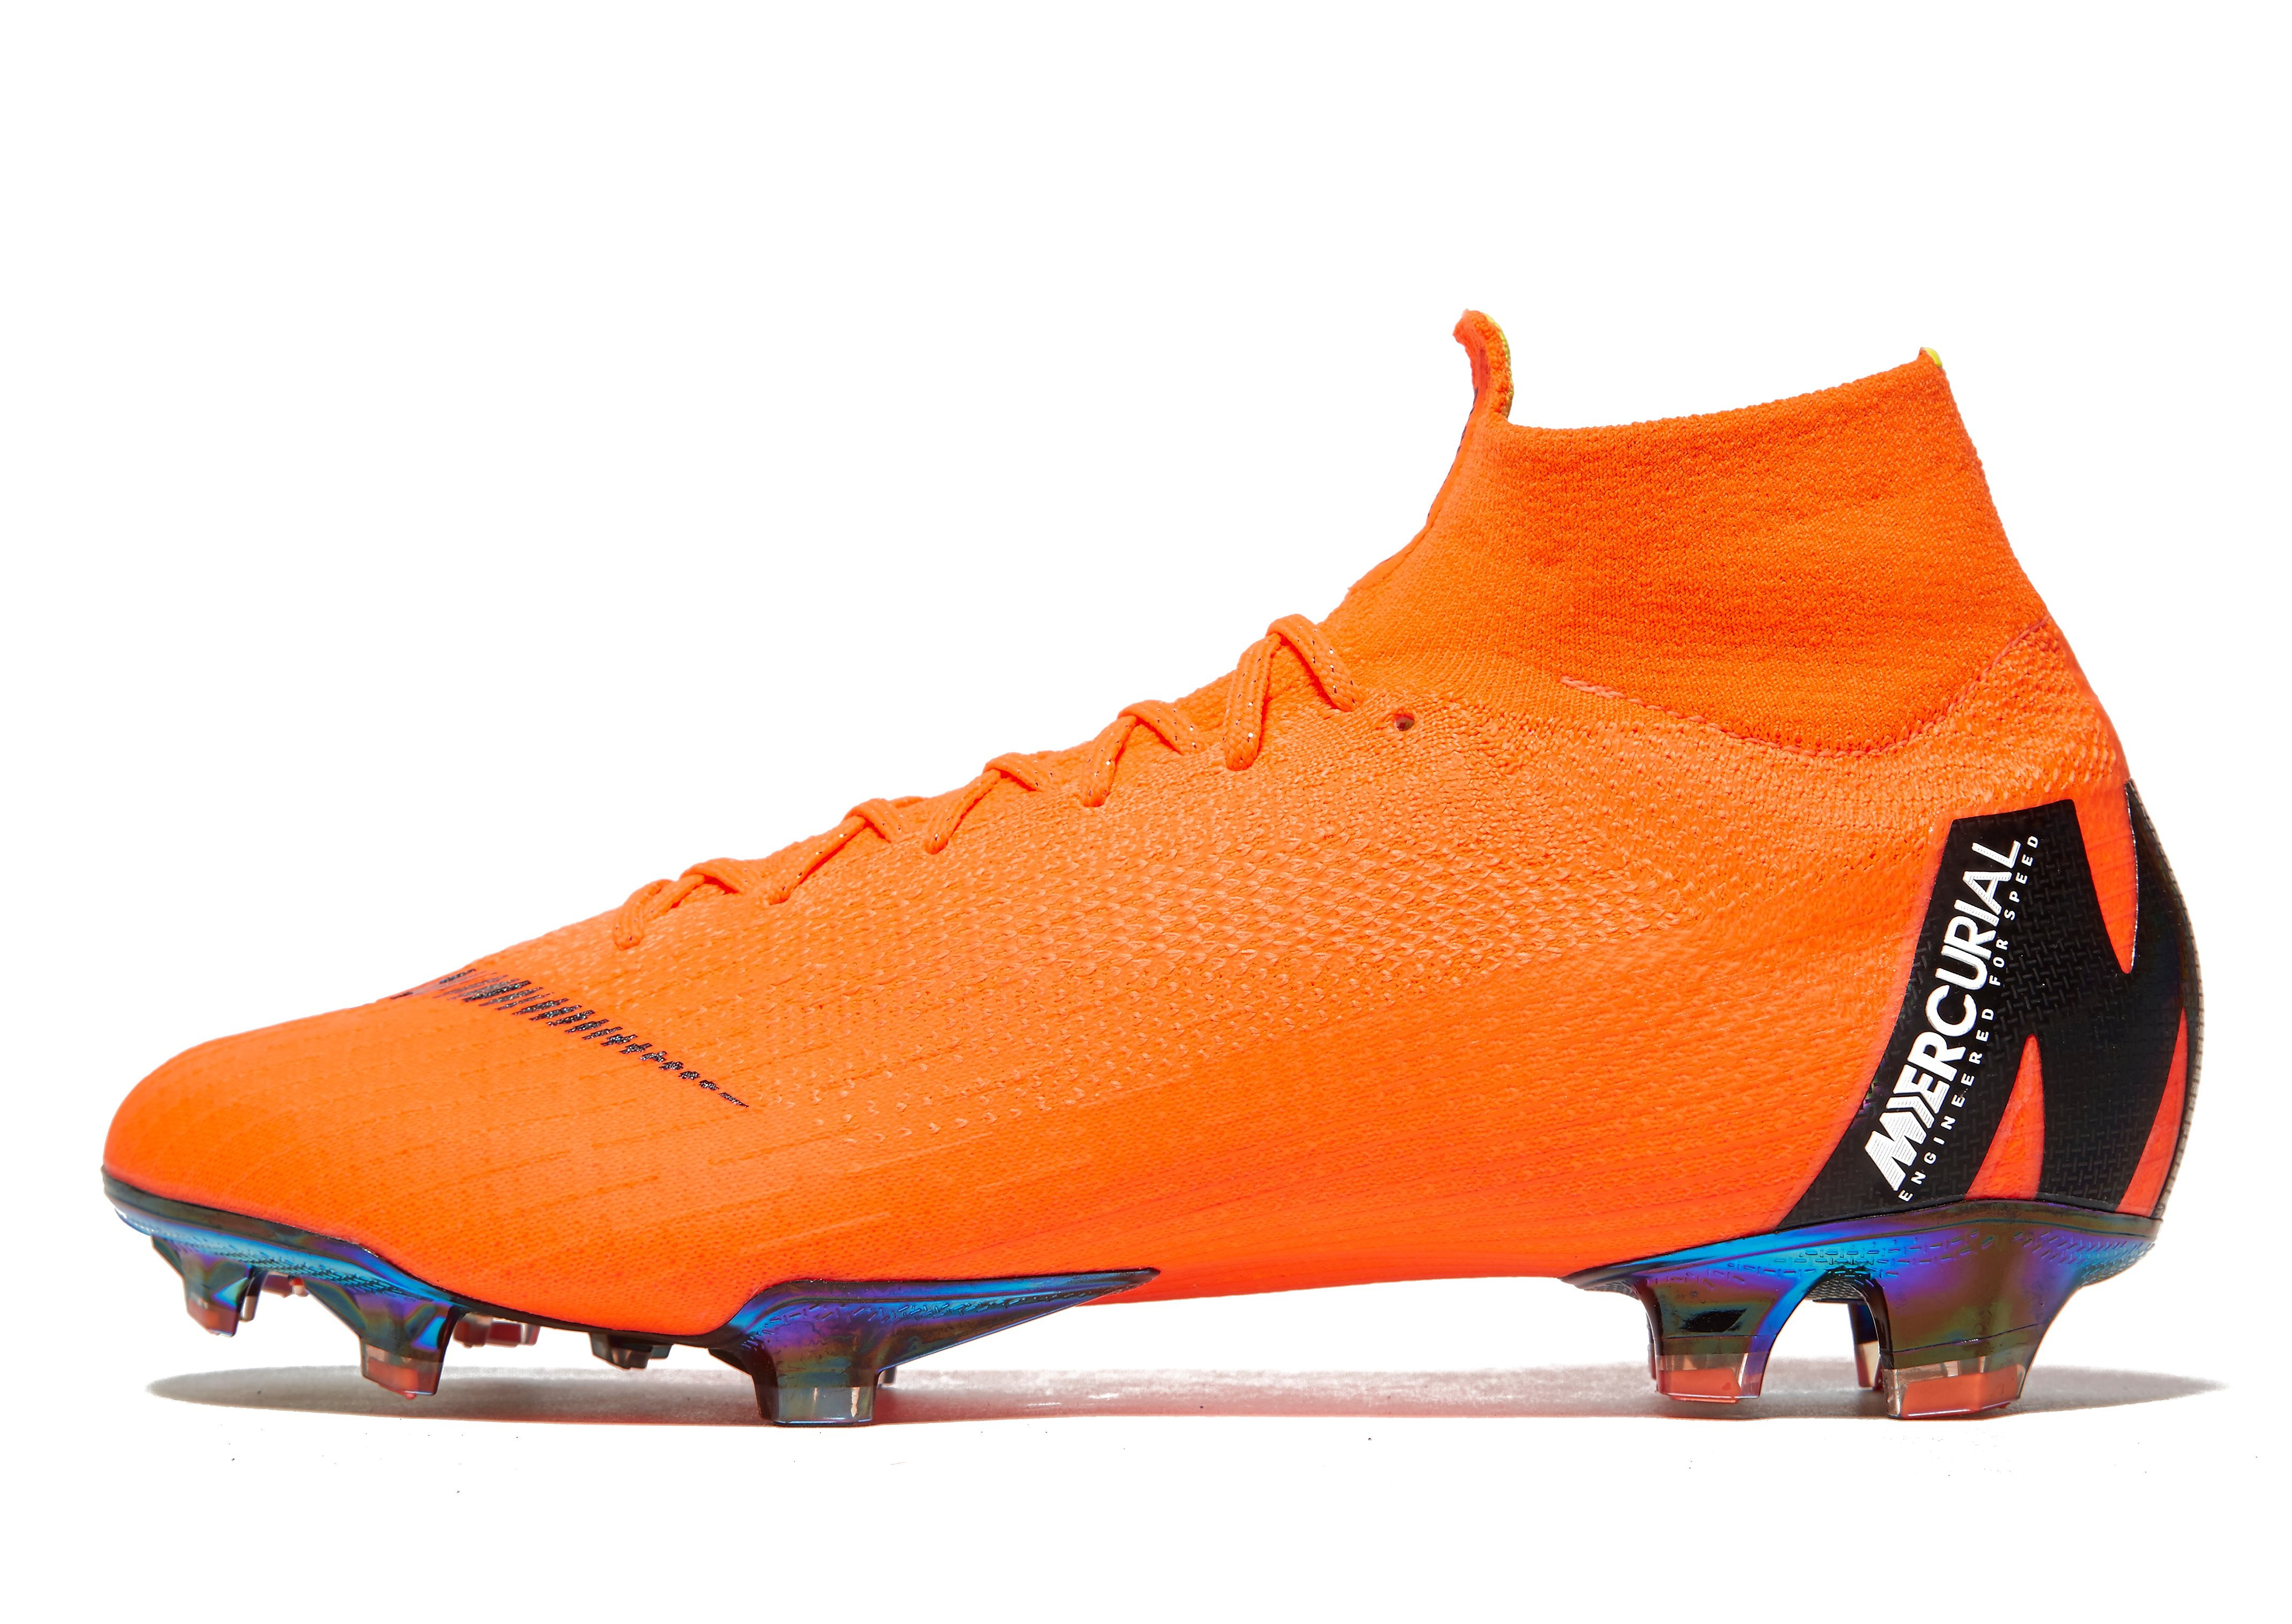 Nike Mercurial 360 Superfly FG Orange-Schwarz